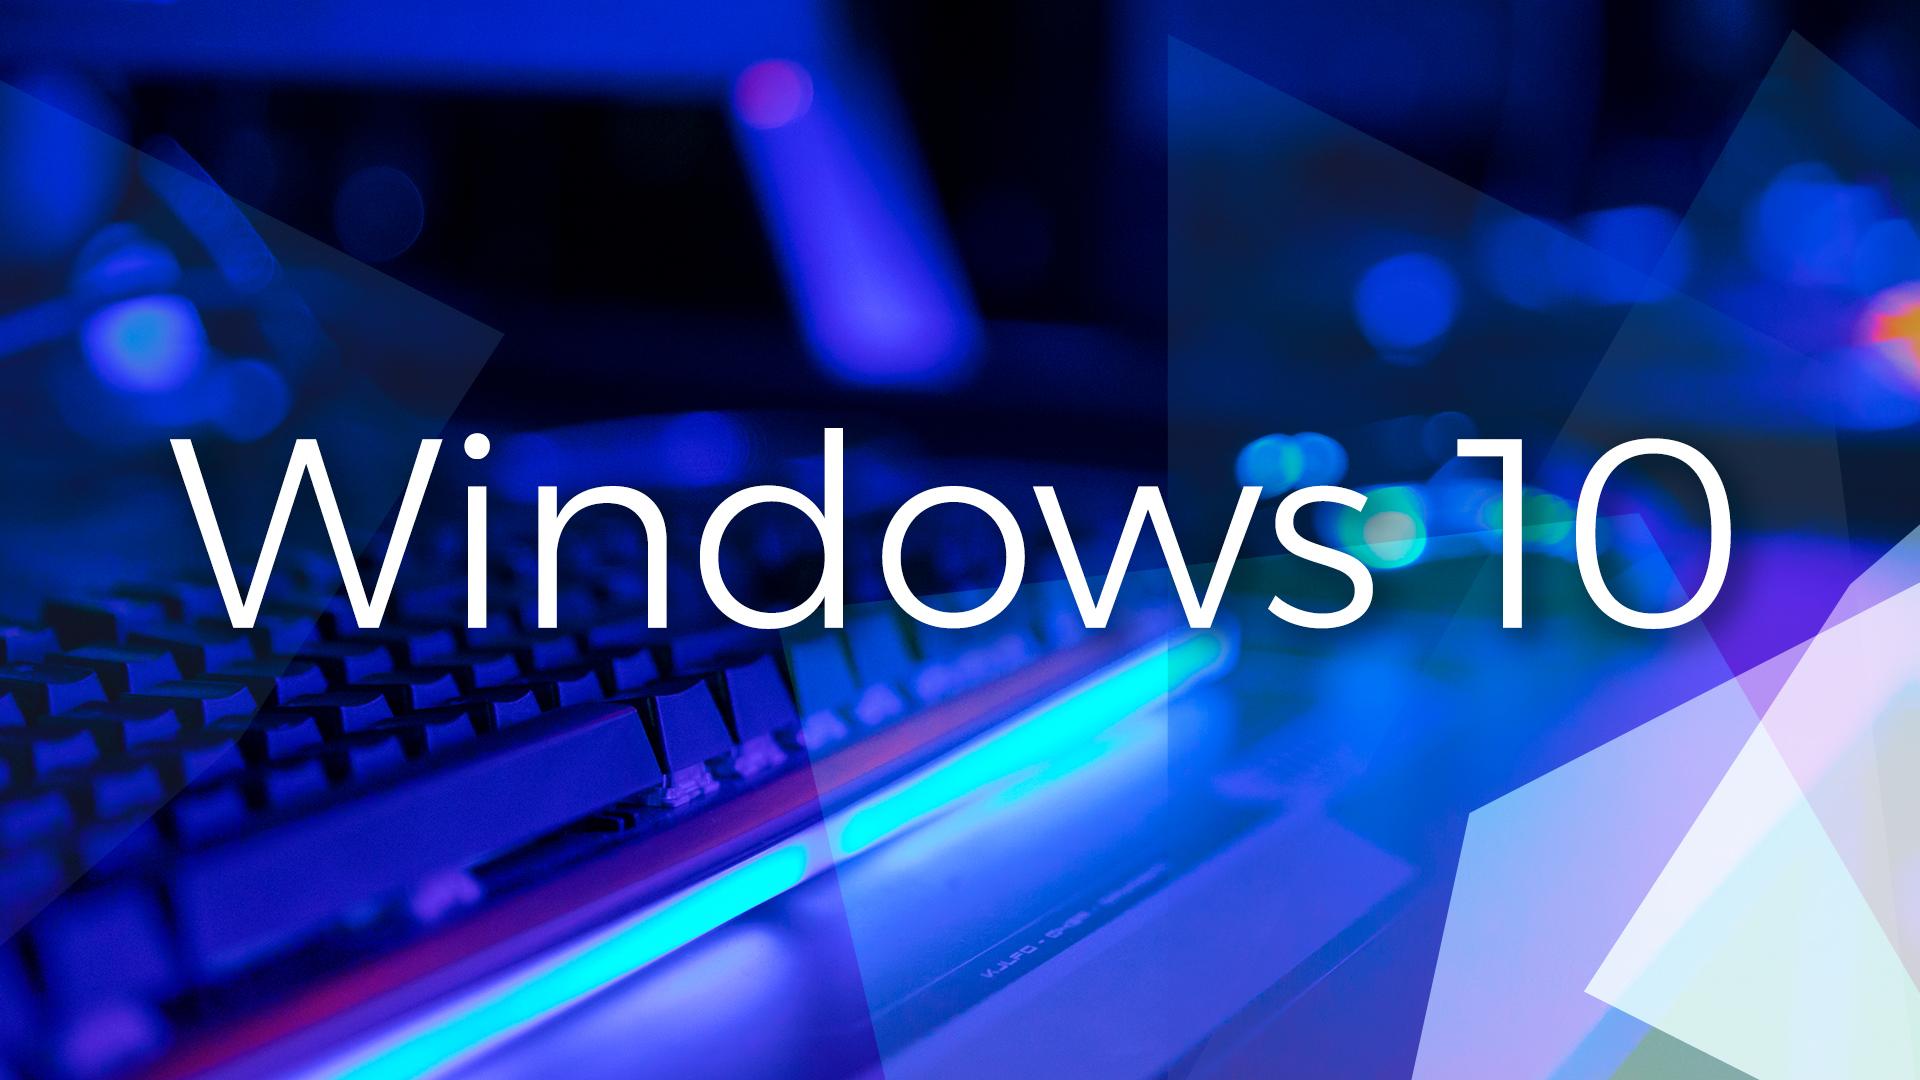 Windows 10, Gaming, Spiele, Games, Tastatur, Game, Keyboard, Videospiele, Microsoft Windows 10